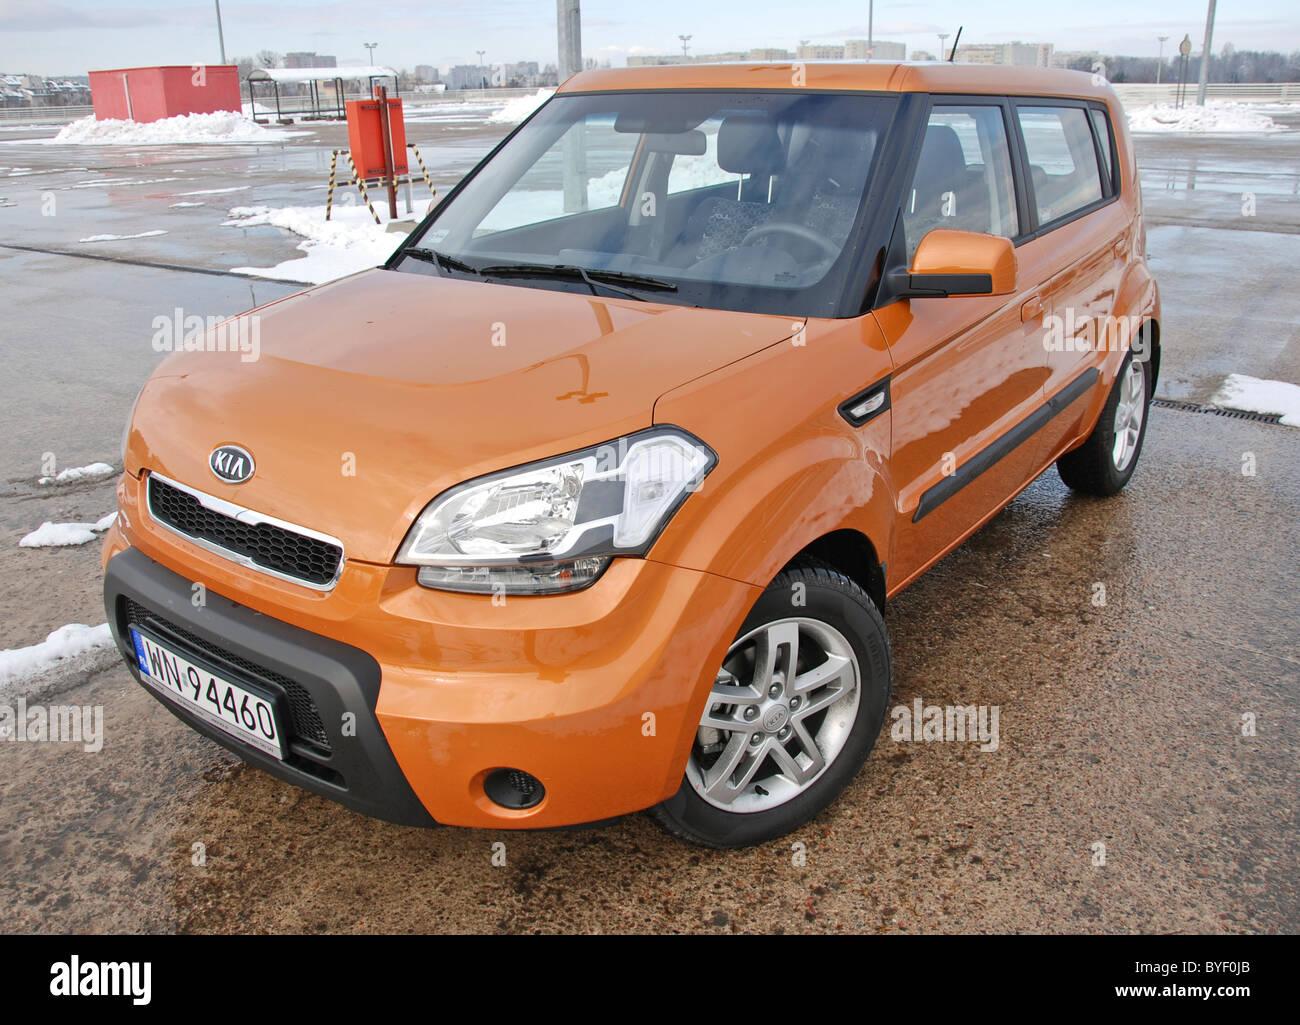 Kia Soul 1.6 - MY 2008 - orange - five doors (5D) - Korean popular subcompact mini van car, small MPV - park space, Stock Photo